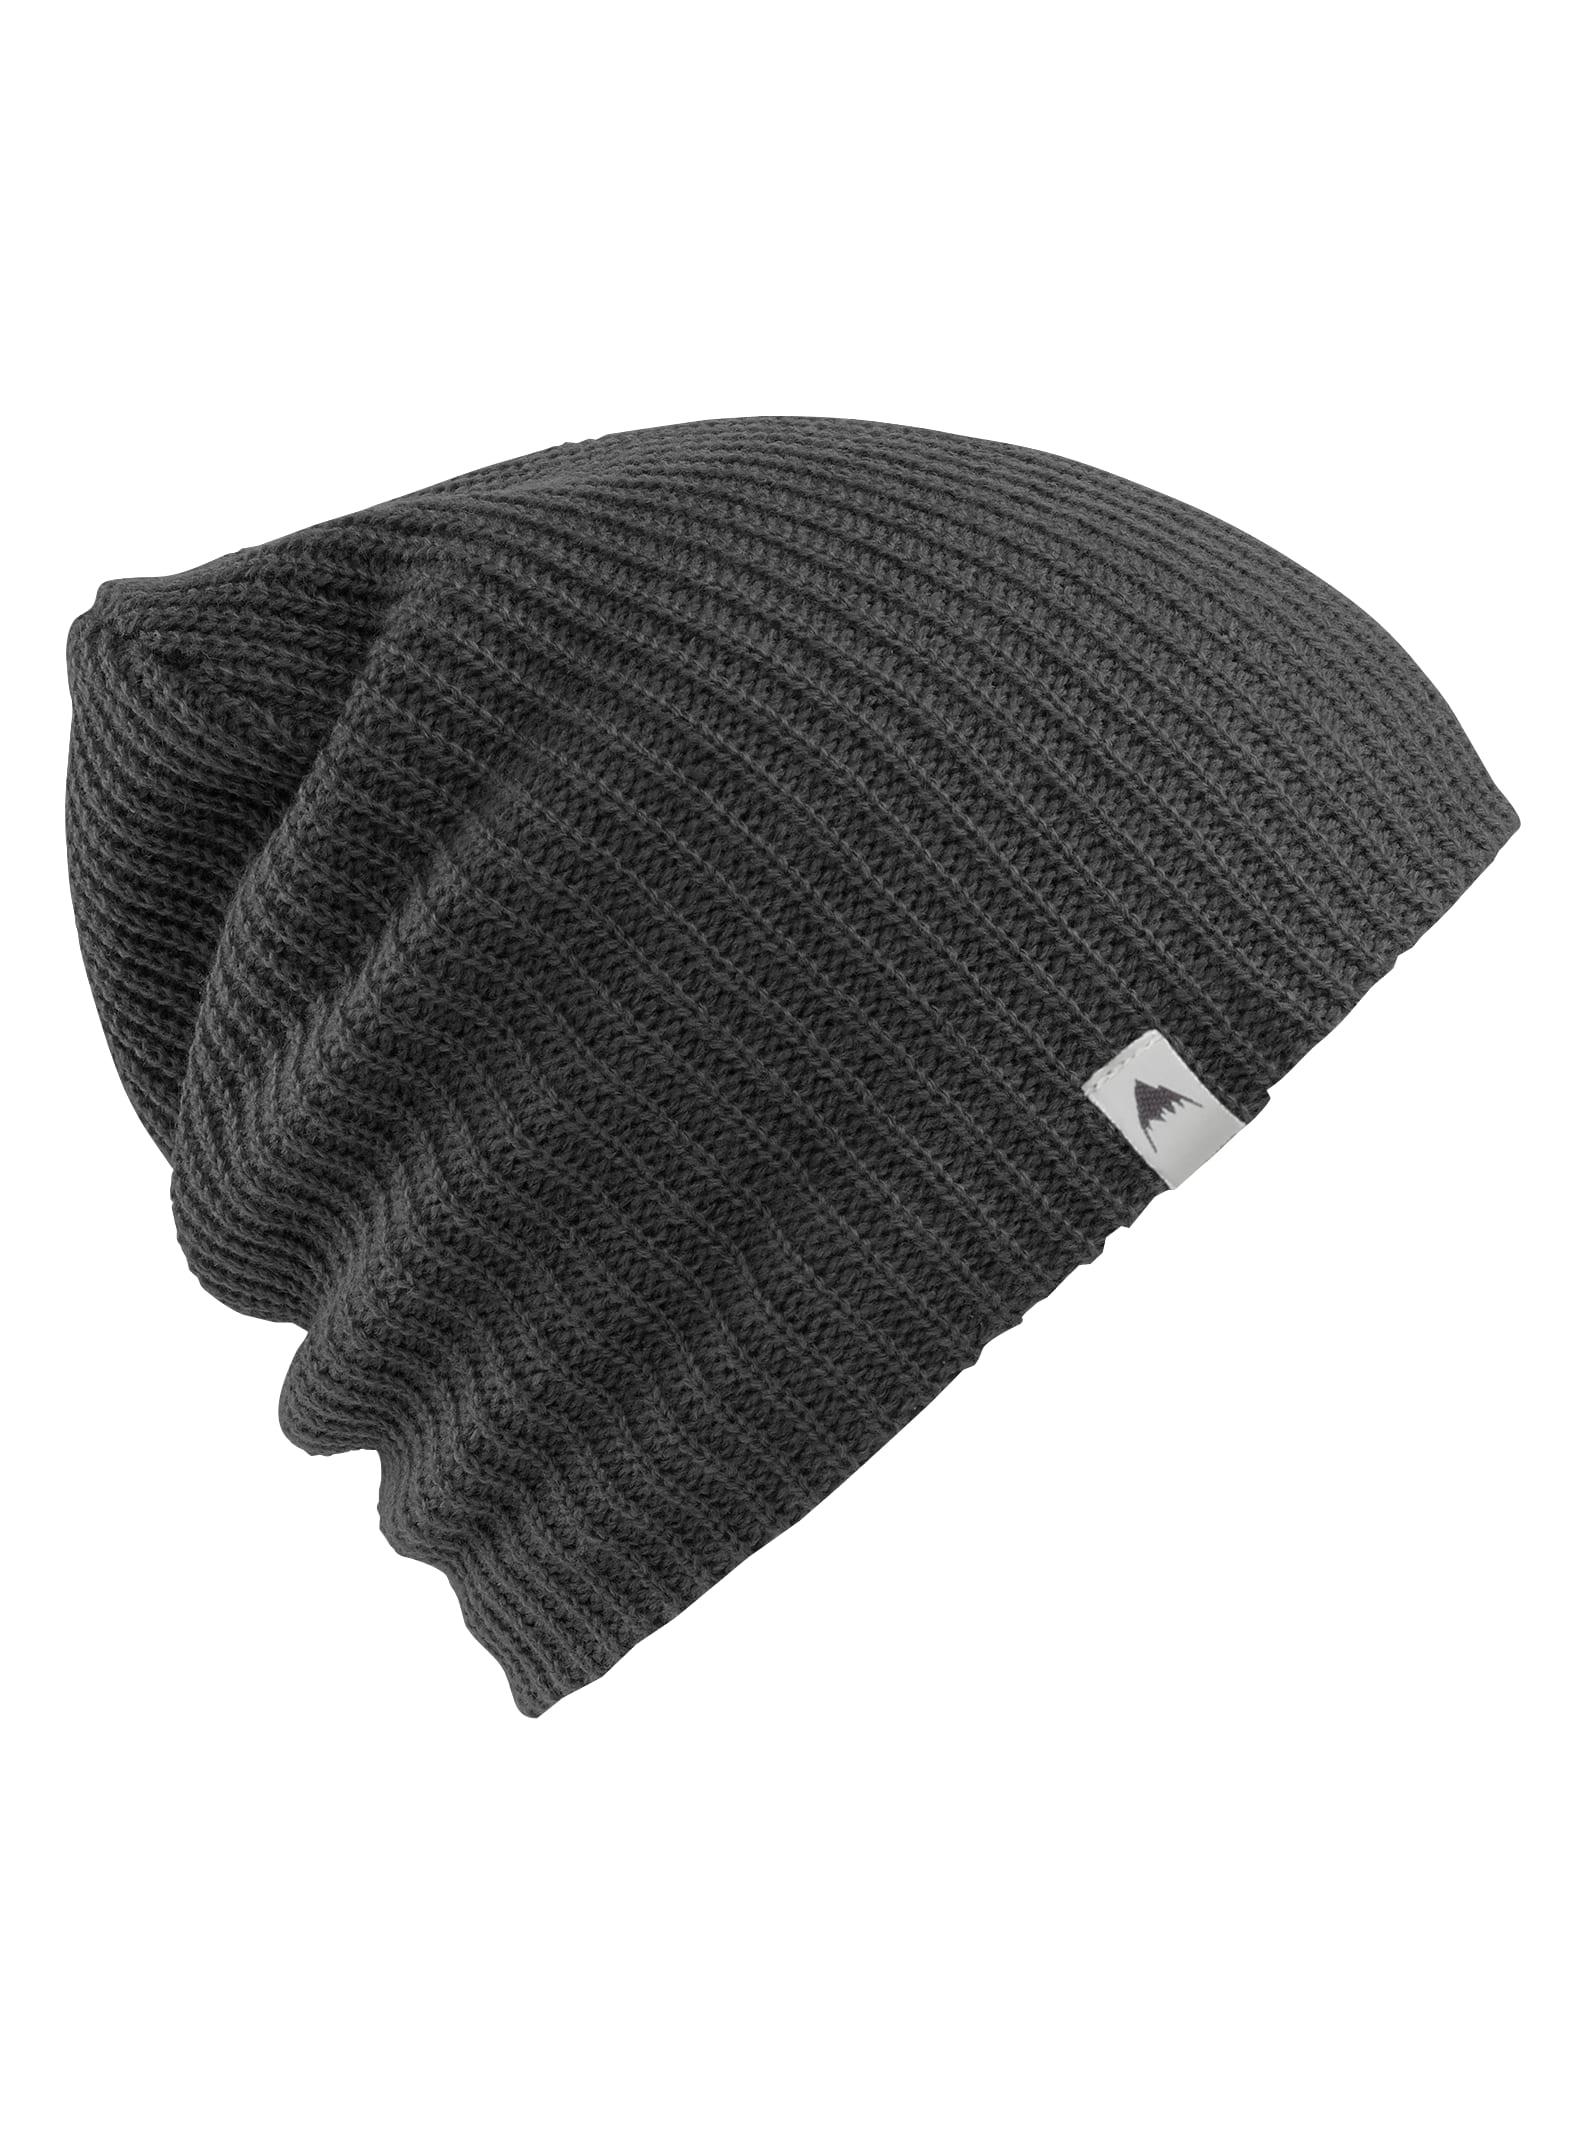 Men s Hats   Beanies  ecfdbcb640af